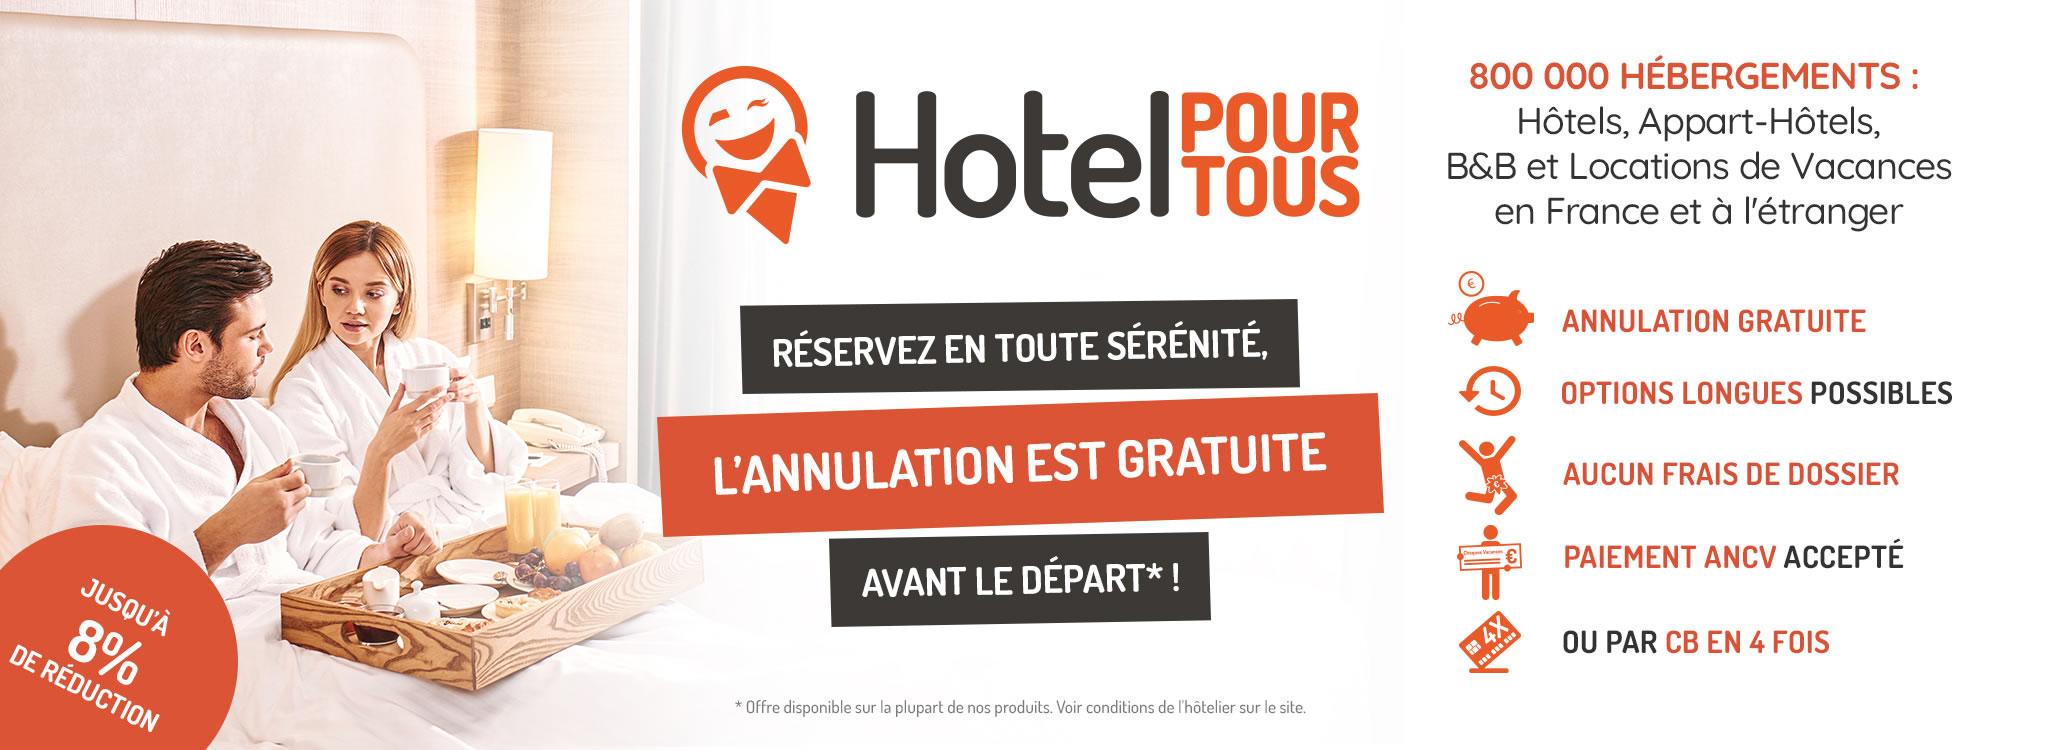 HOTEL-2060x750